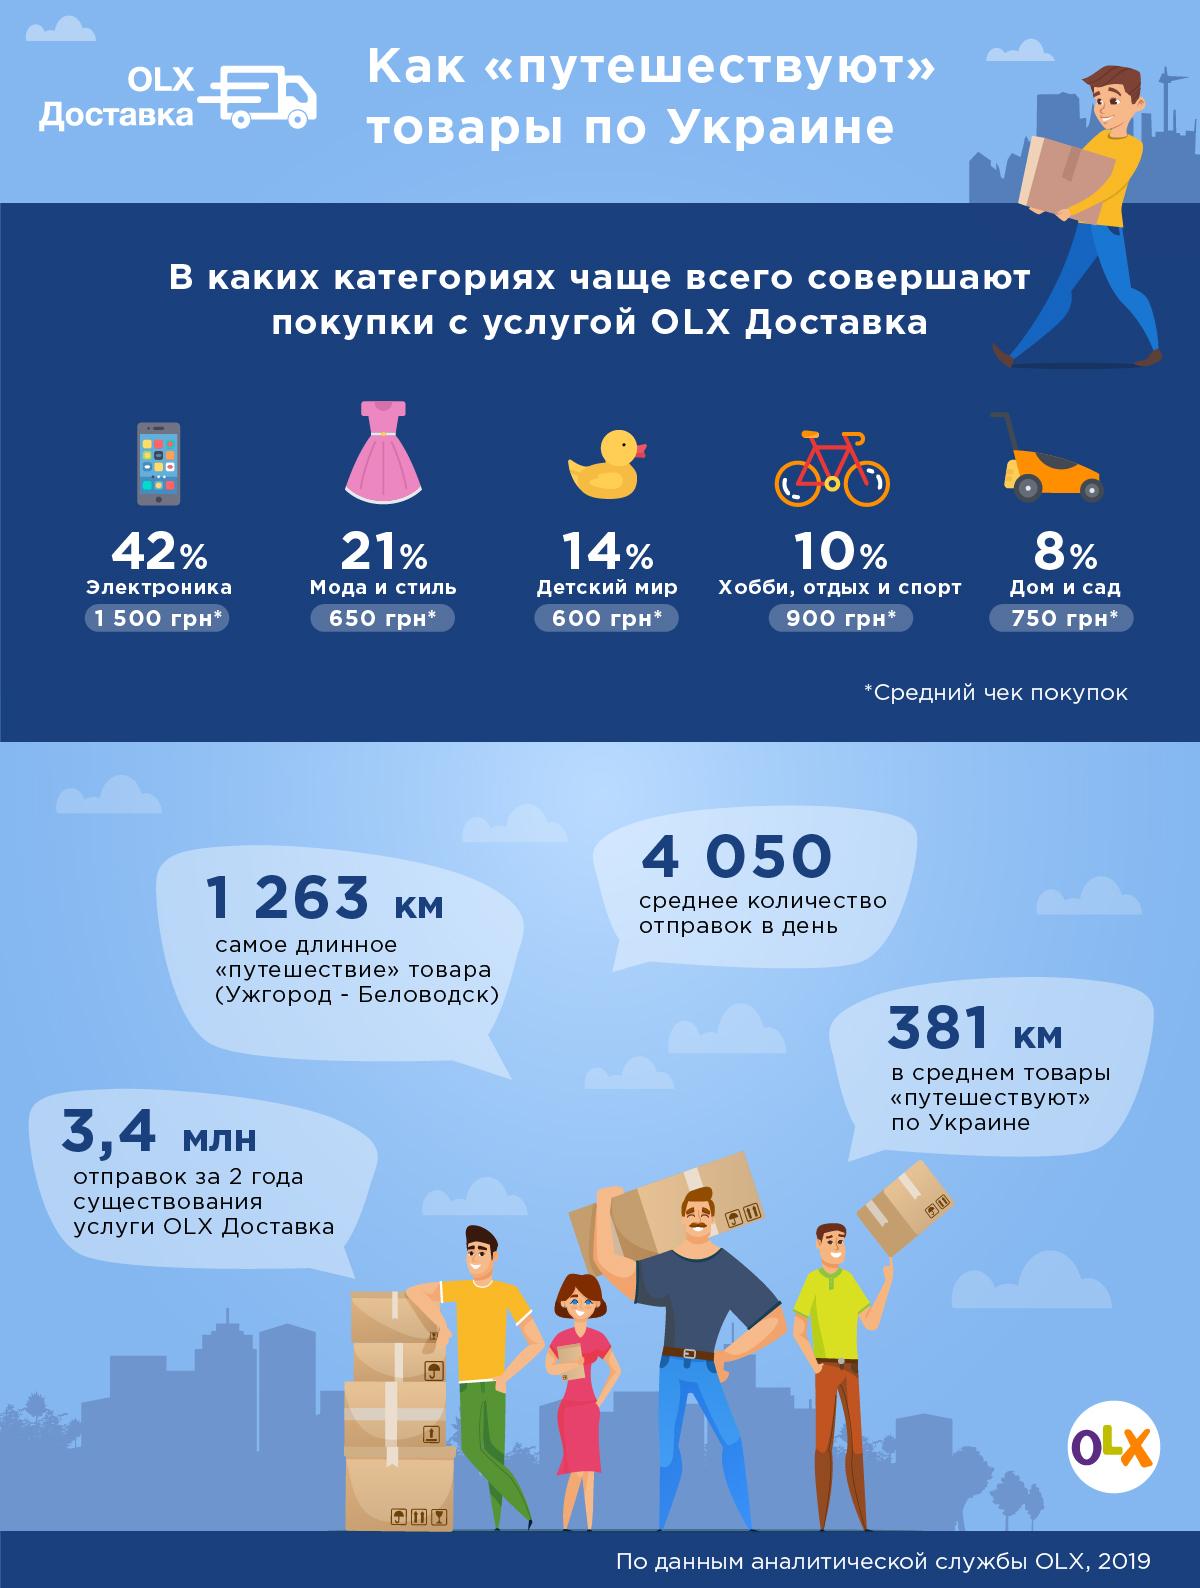 Инфографика от OLX